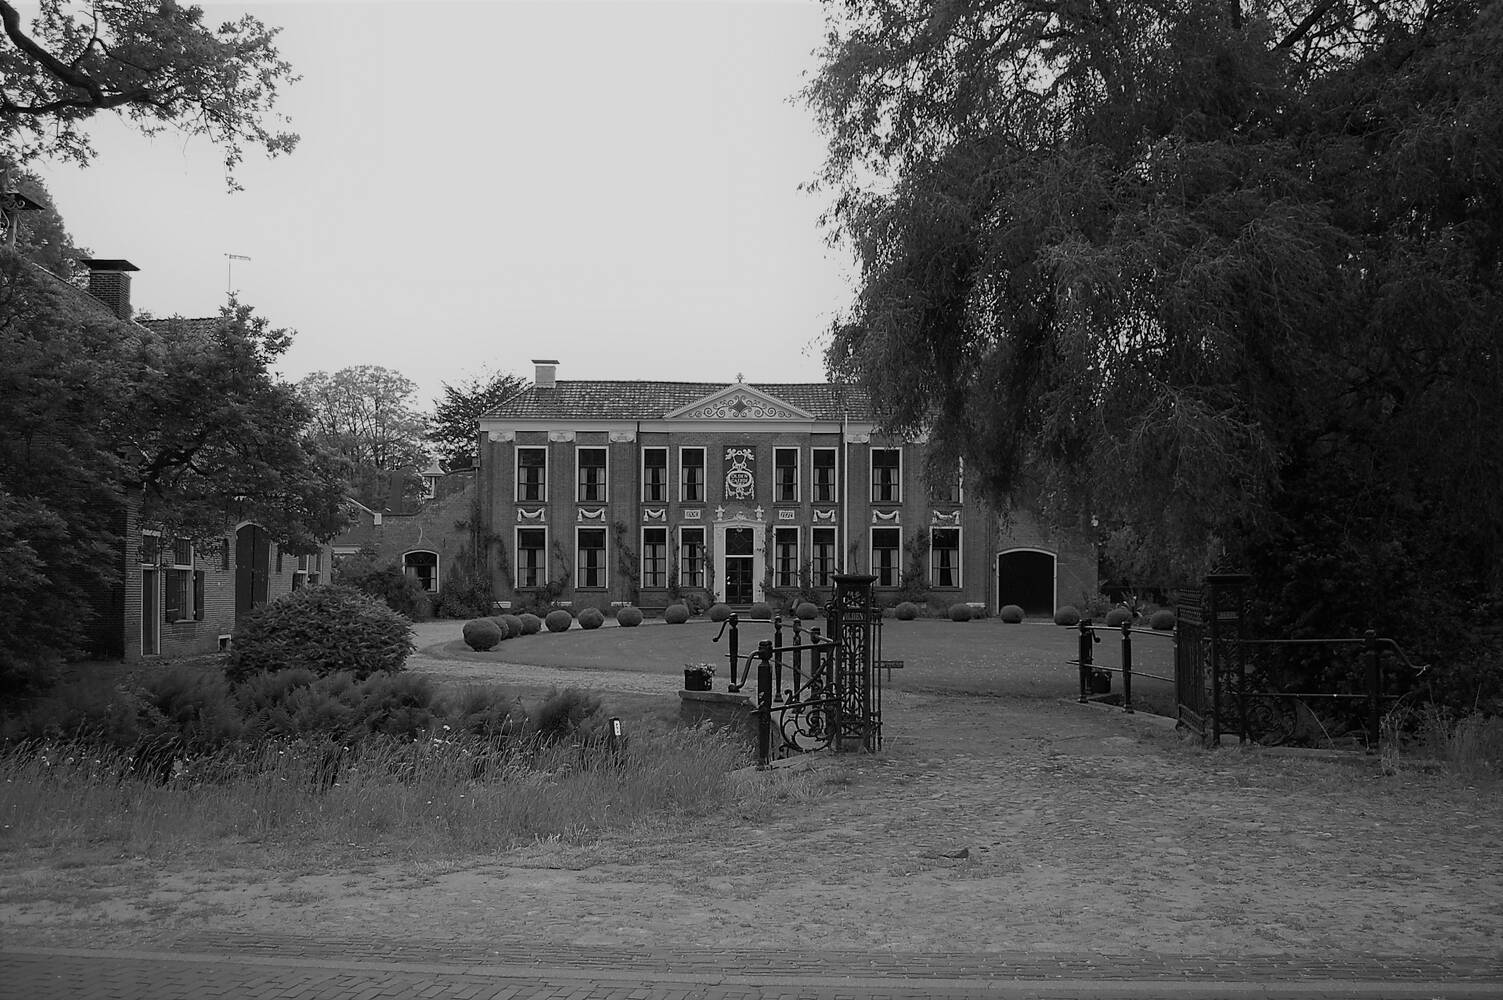 Havezate Oldengaerde (Westeinde 57)